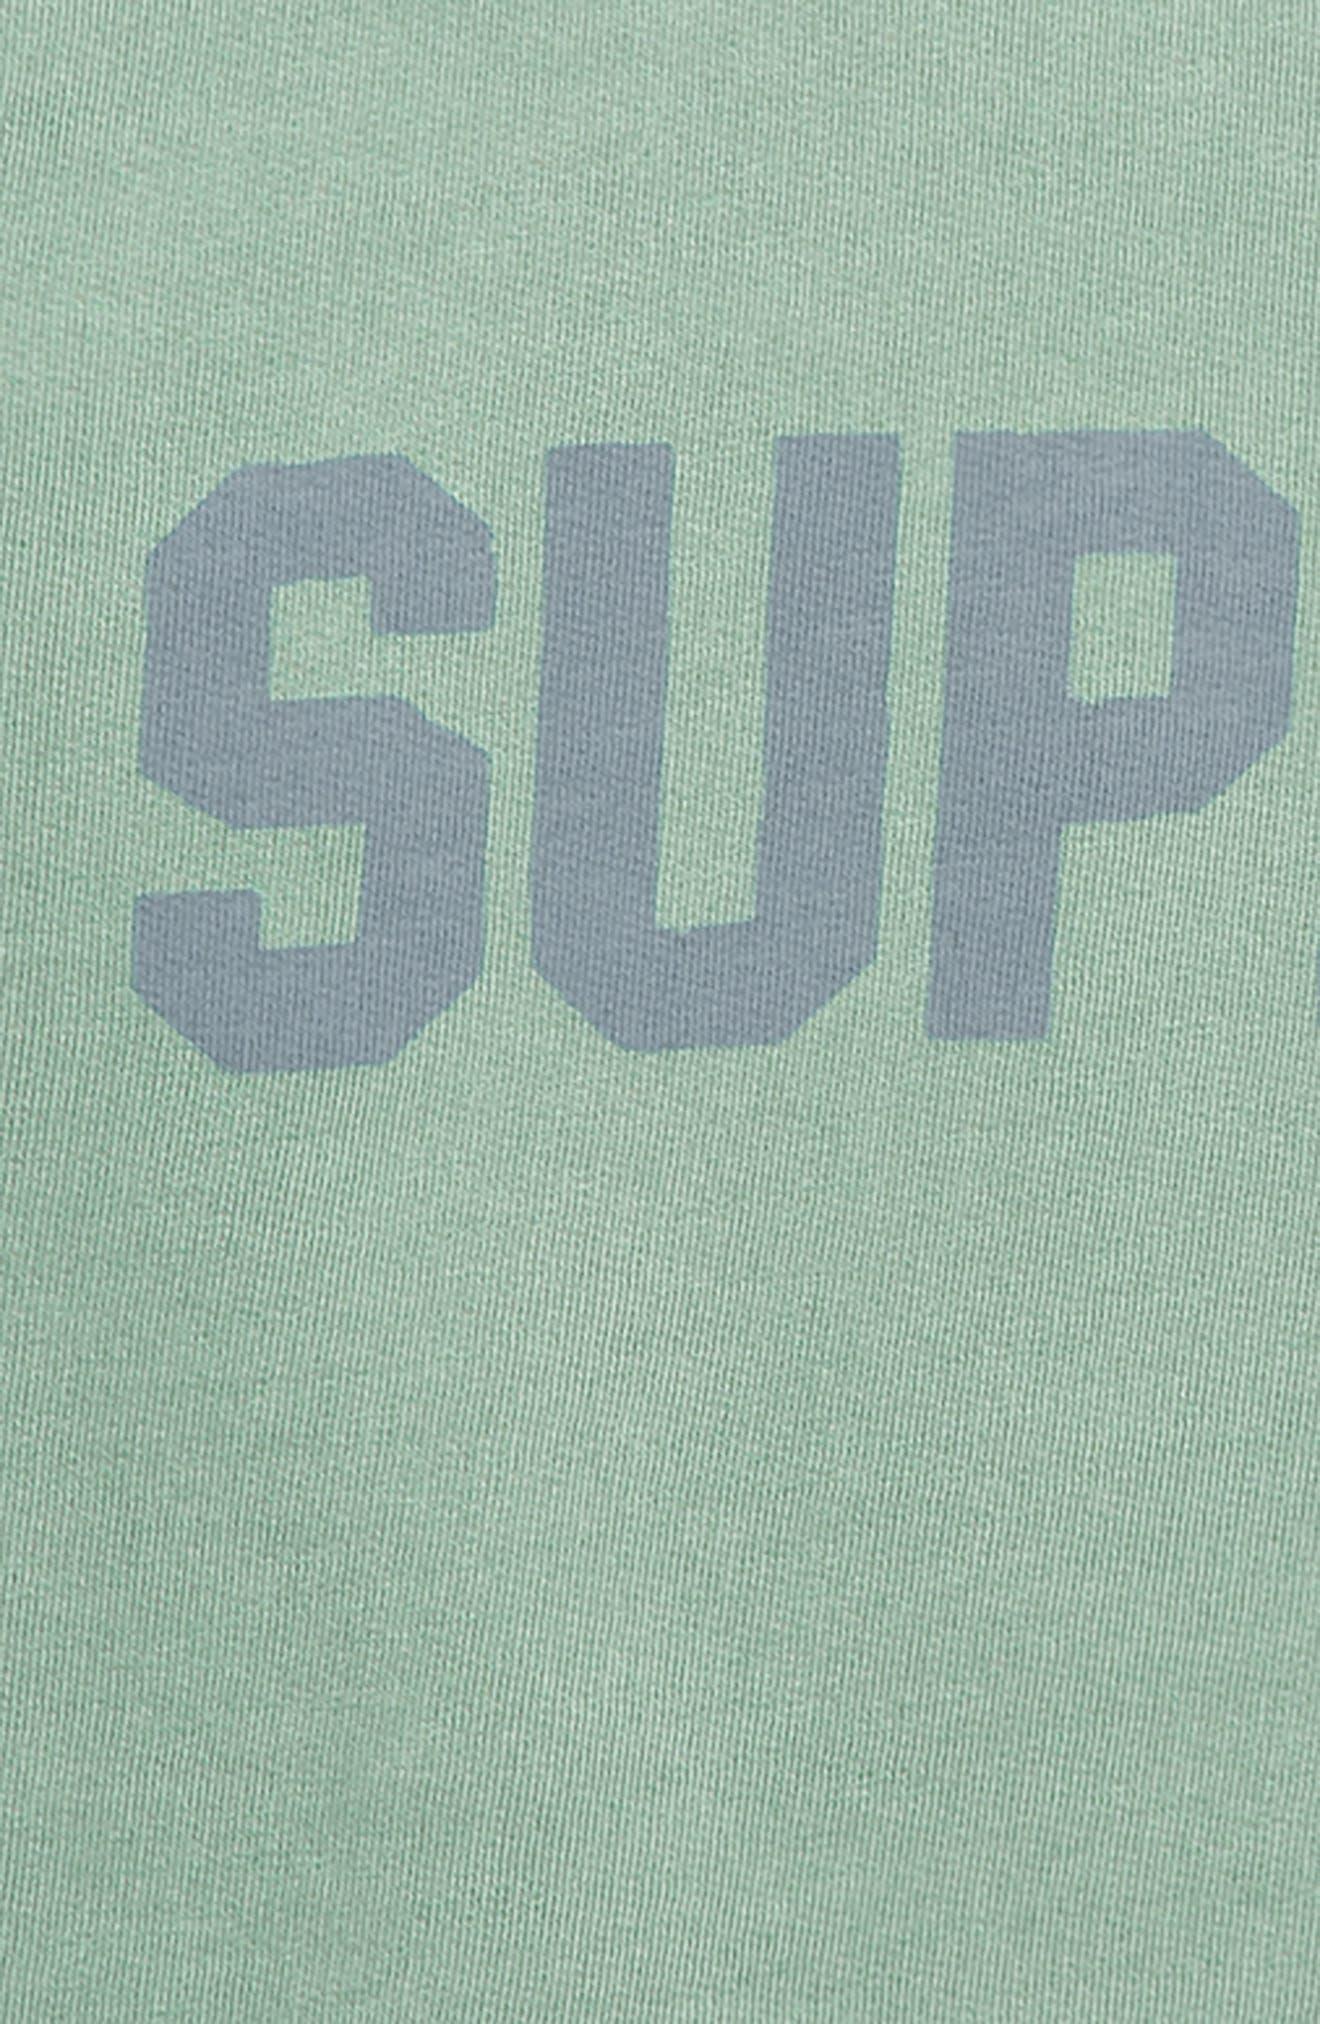 TREASURE & BOND, Washed Wide Sleeve Sweatshirt, Alternate thumbnail 2, color, GREEN WING SUPER